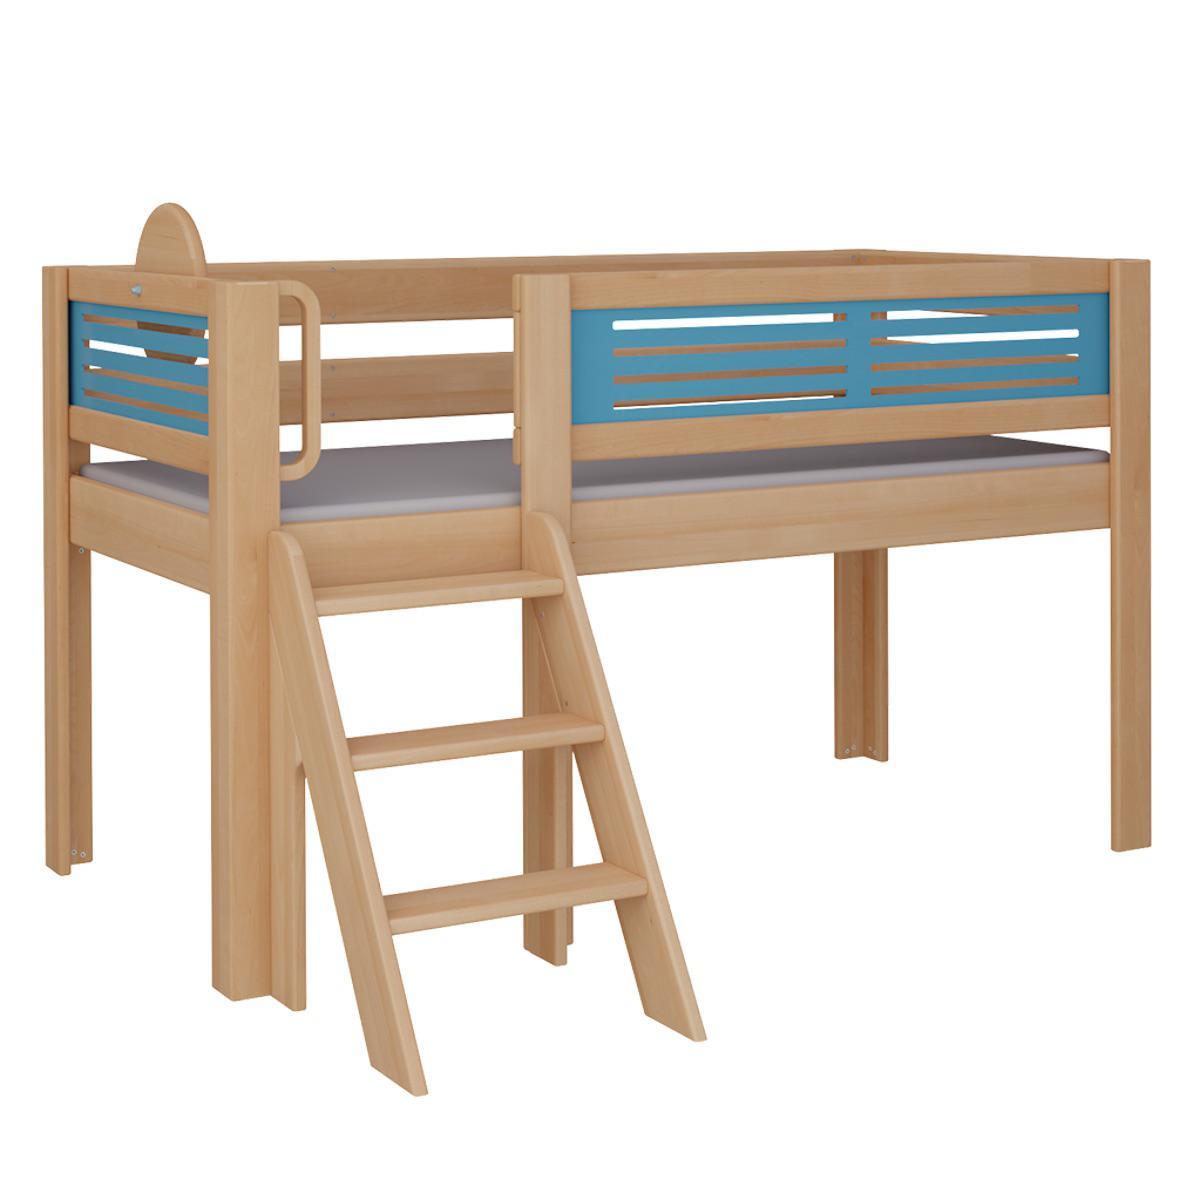 Tatü halbhohes Bett mit Treppe DELUXE De Breuyn natur geölt Füllungen blau